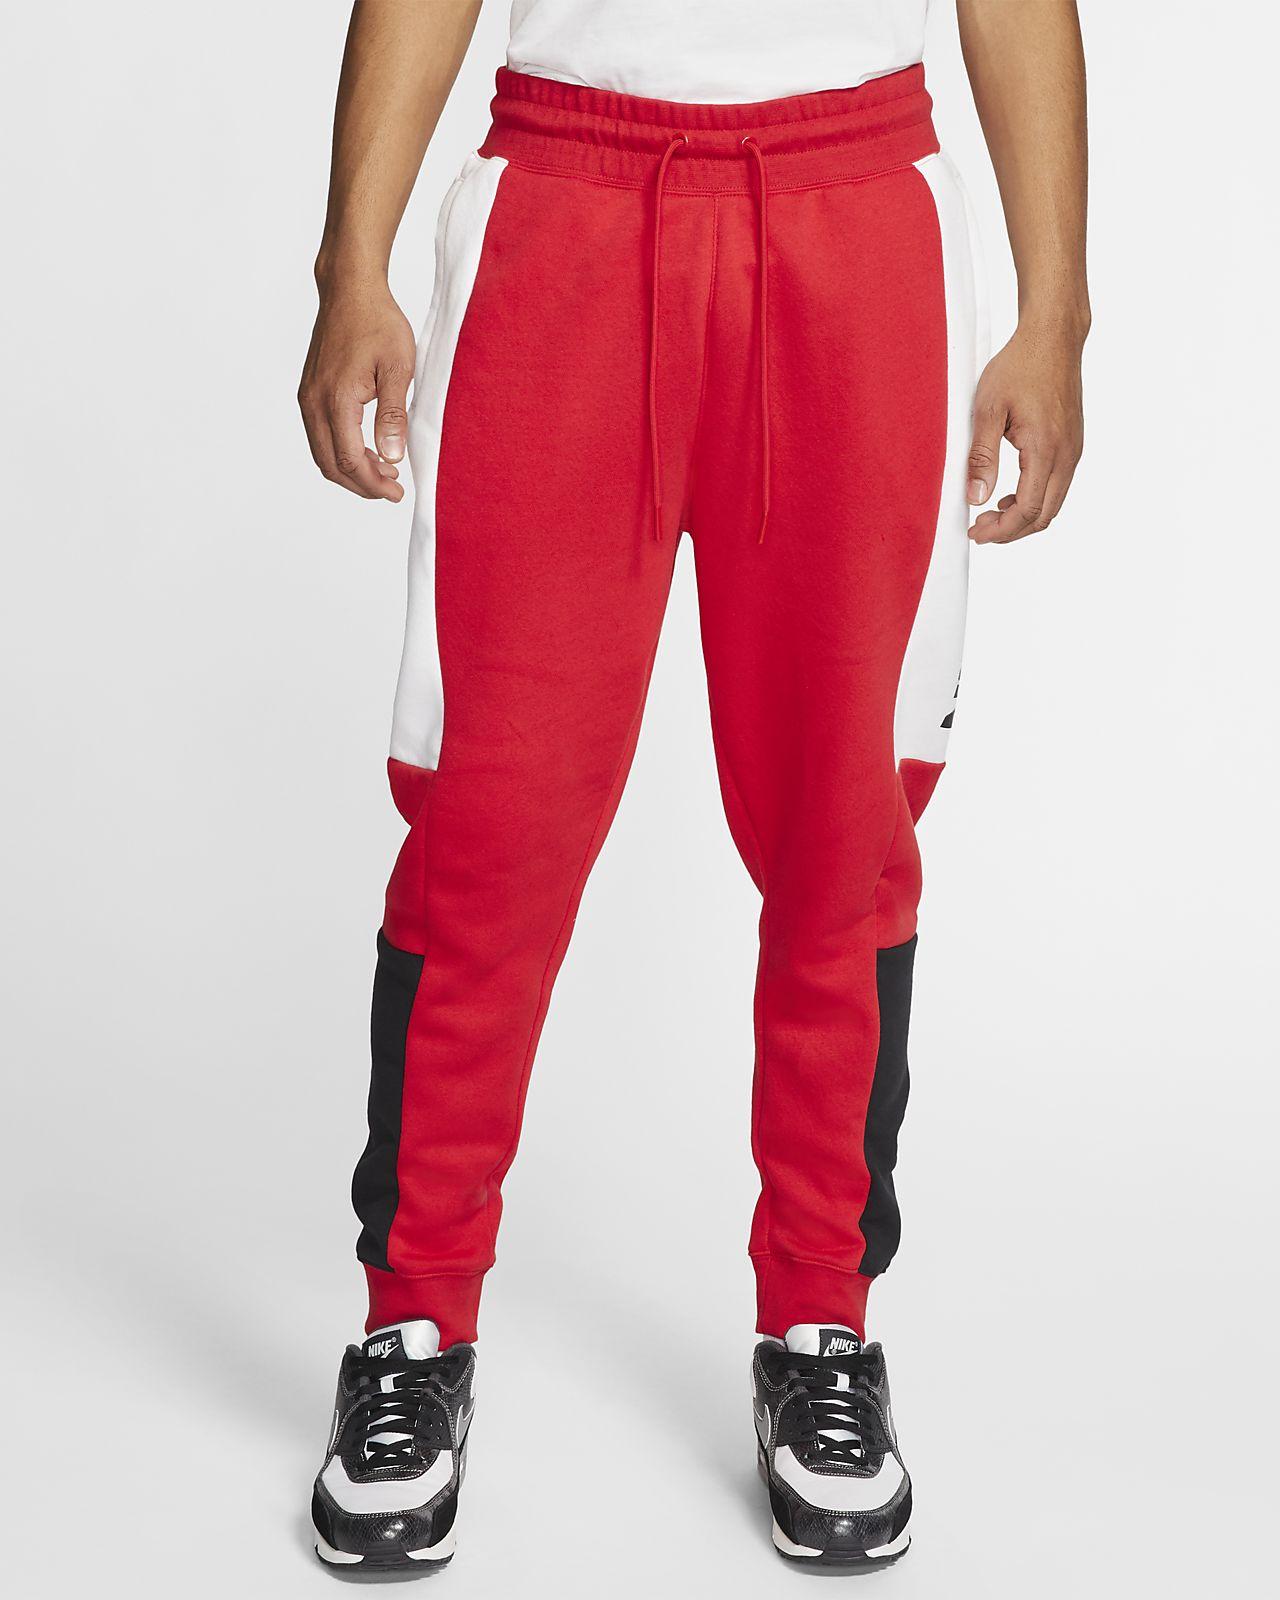 Pantalones de tejido Fleece para hombre Nike Air